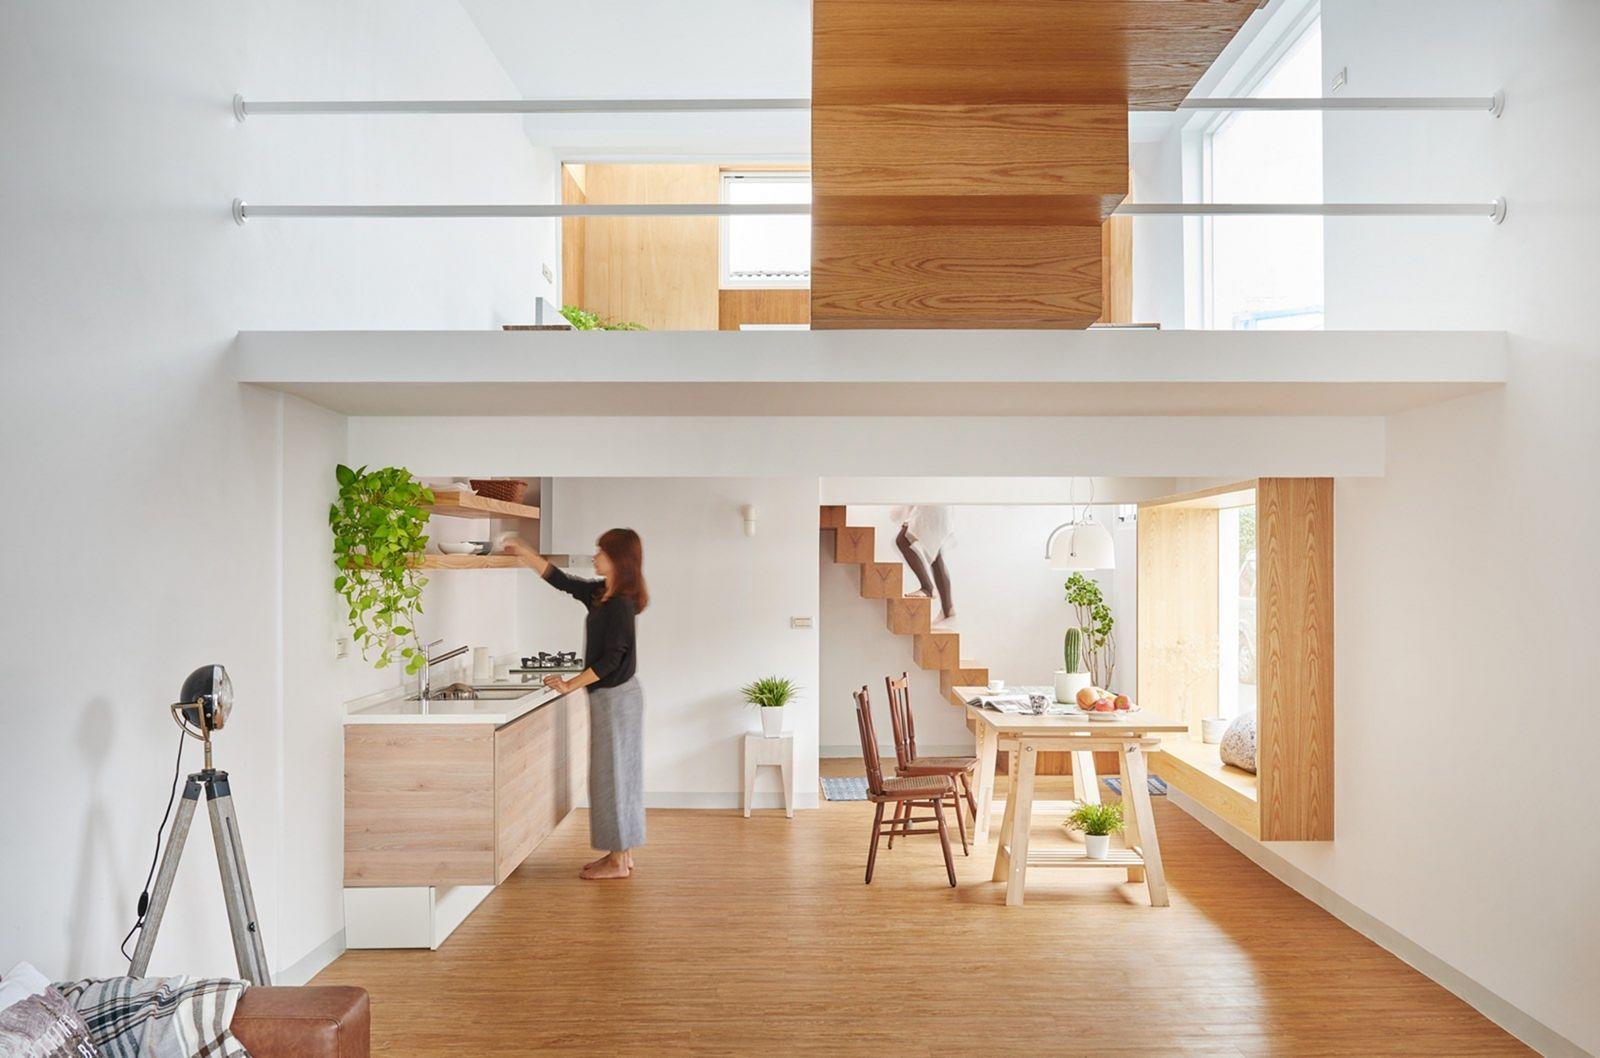 rumah kecil nyaman konsep mezzanine